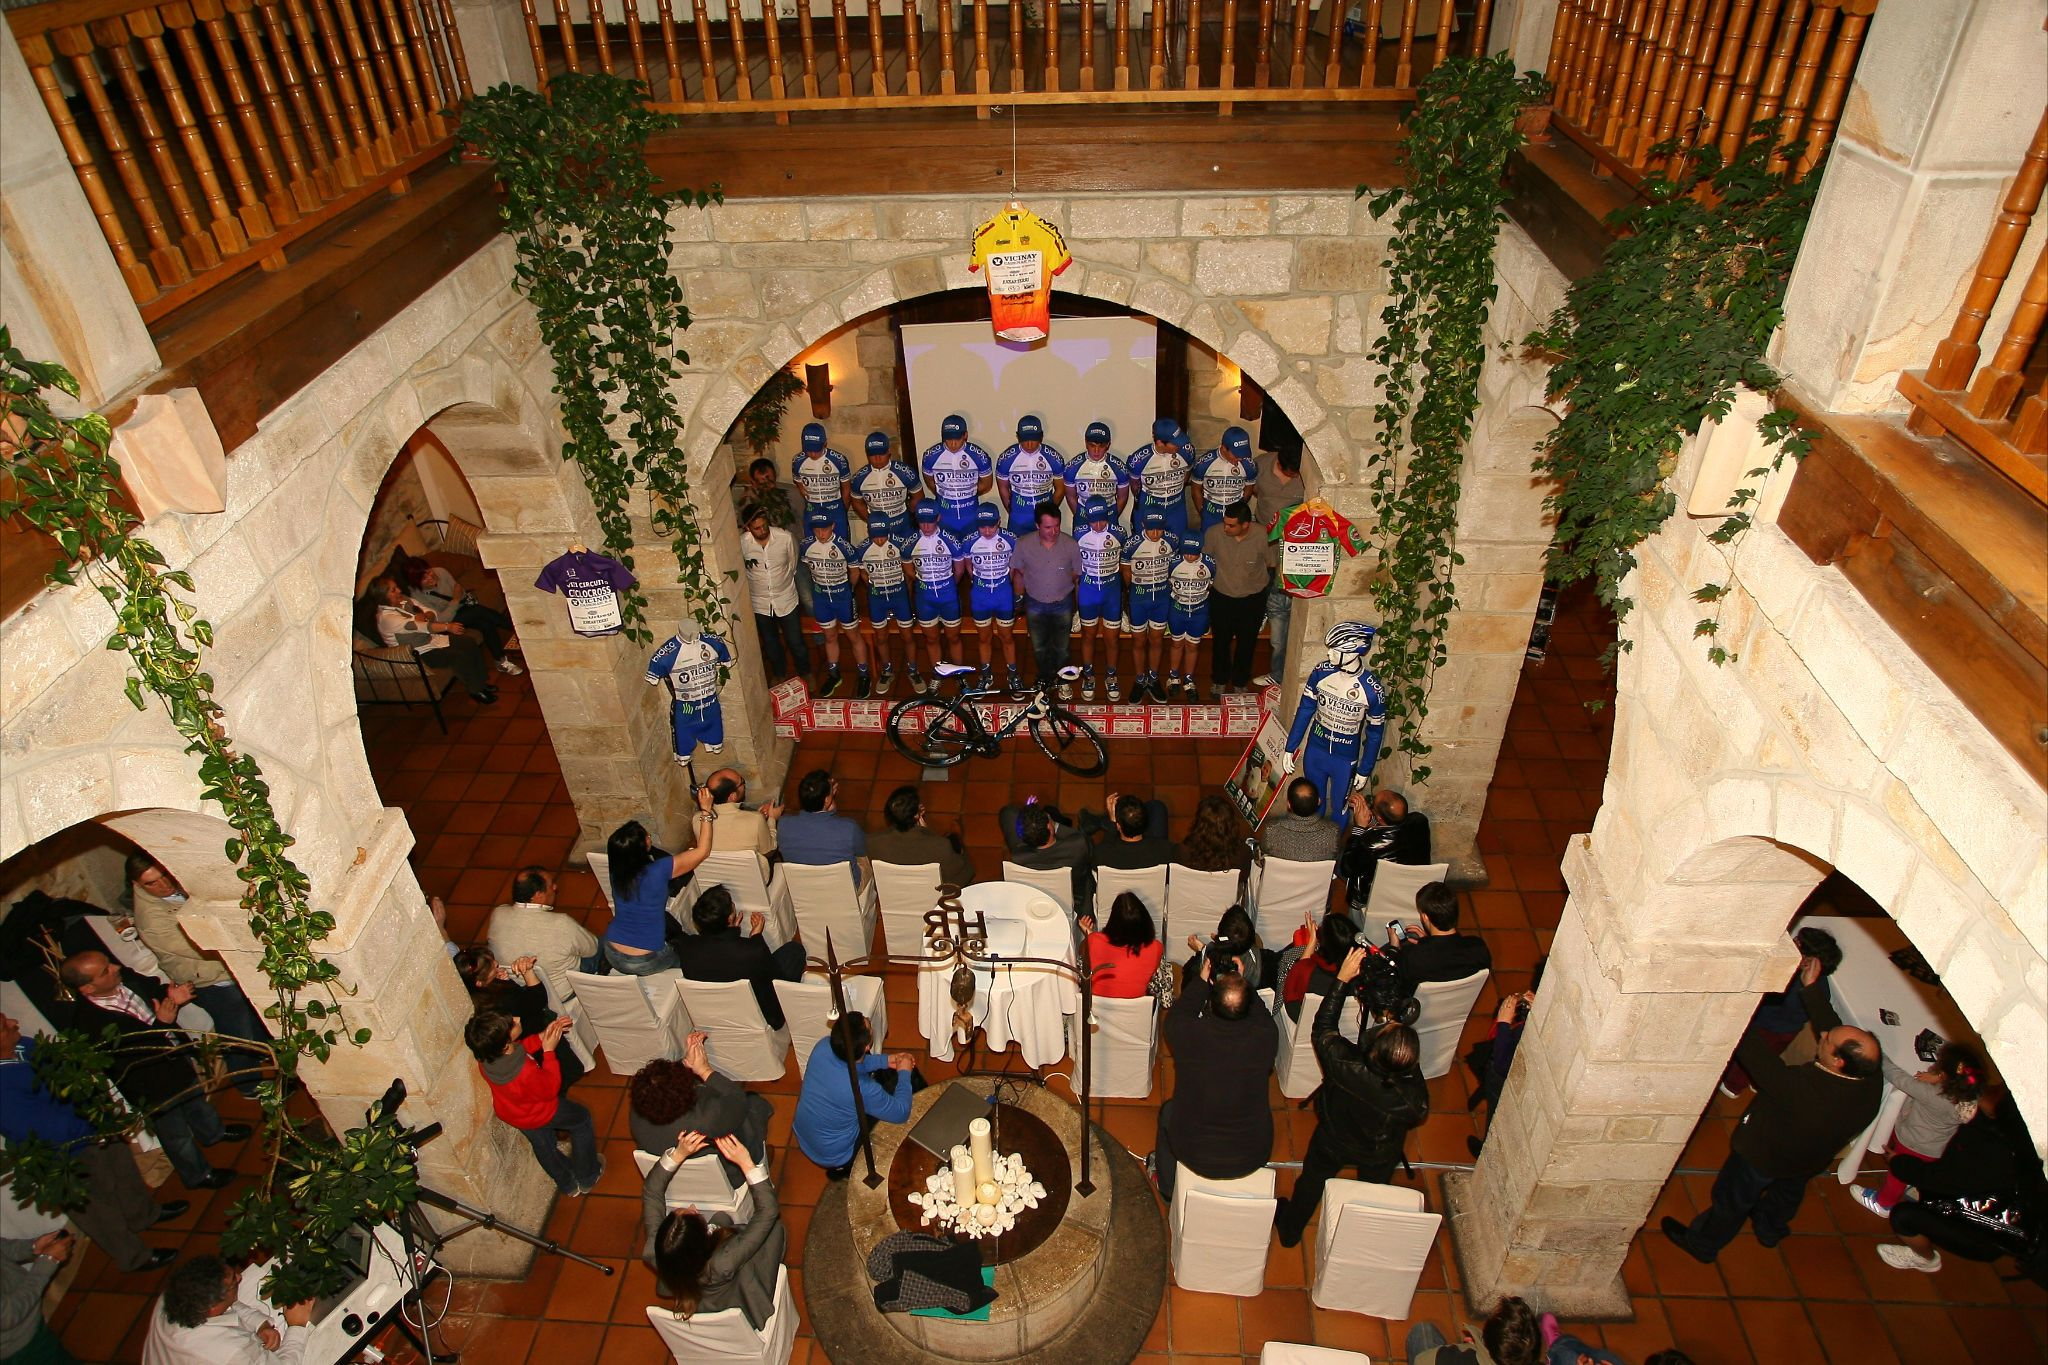 Presentación equipo VICINAY CADENAS-A.D Enkarterri 2013